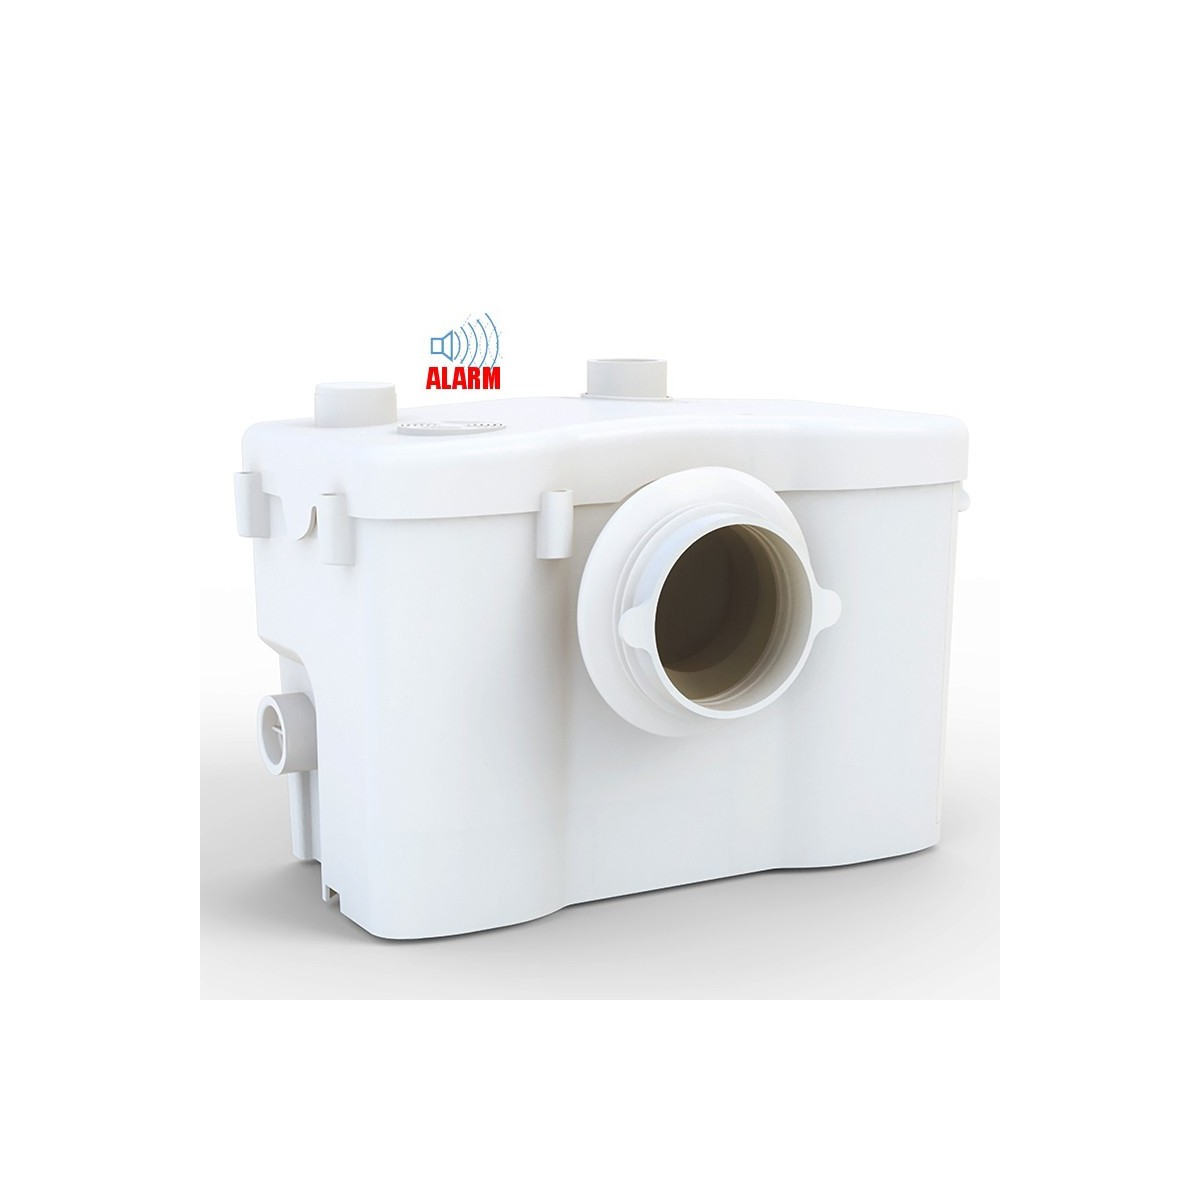 Broyeur-sanitaire-avec-alarme-BSF600